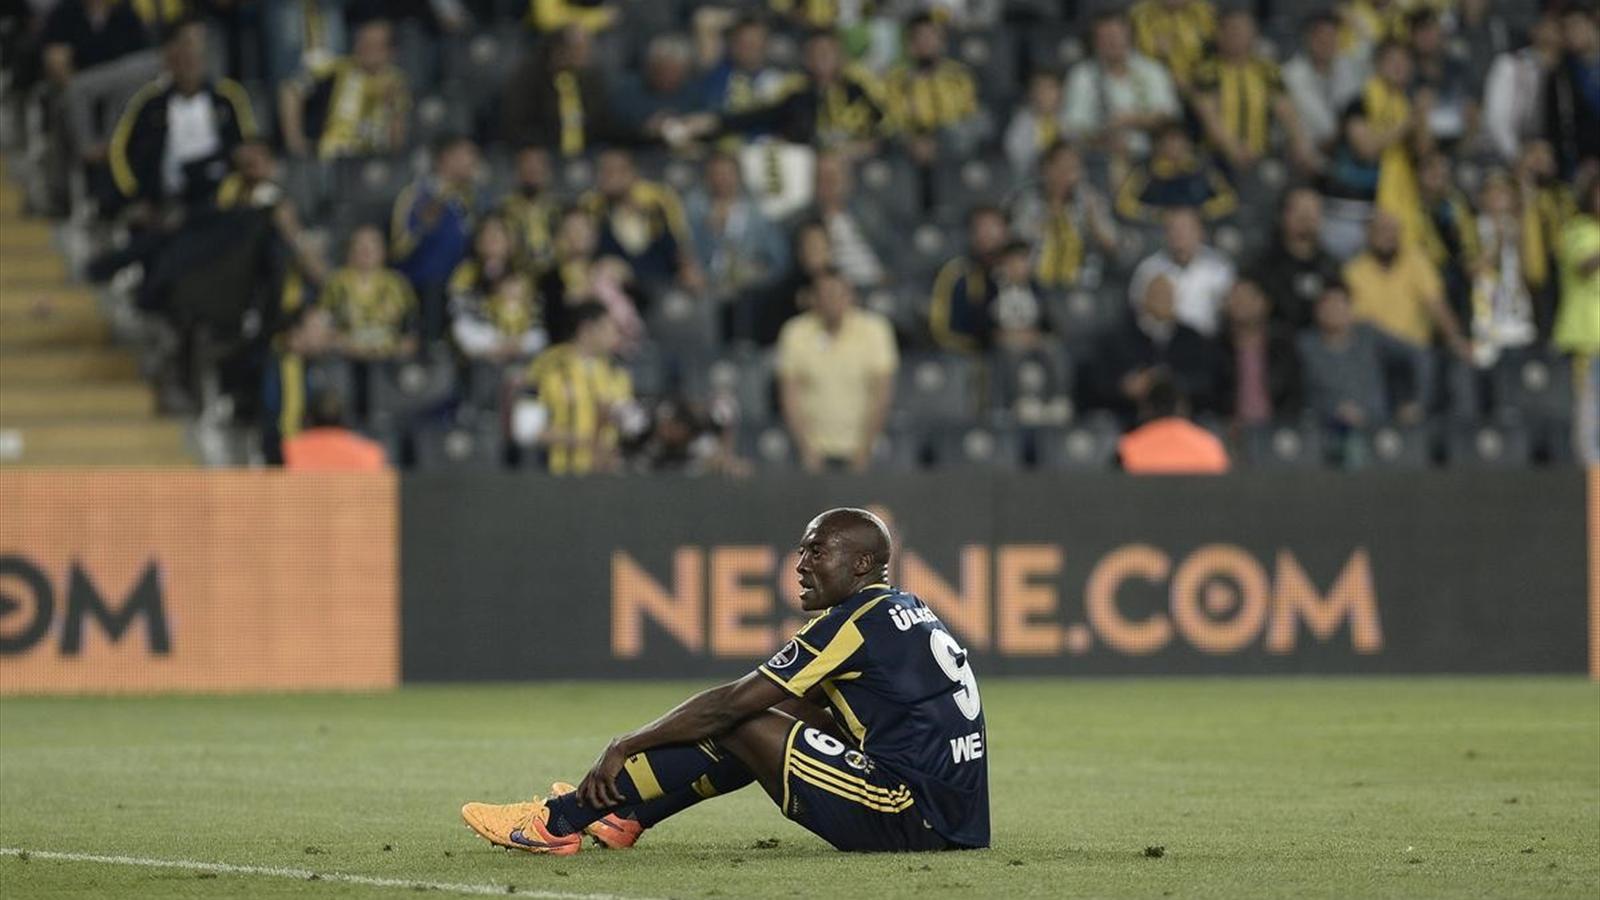 Fenerbahçe Kayseri Erciyesspor Pierre Webo